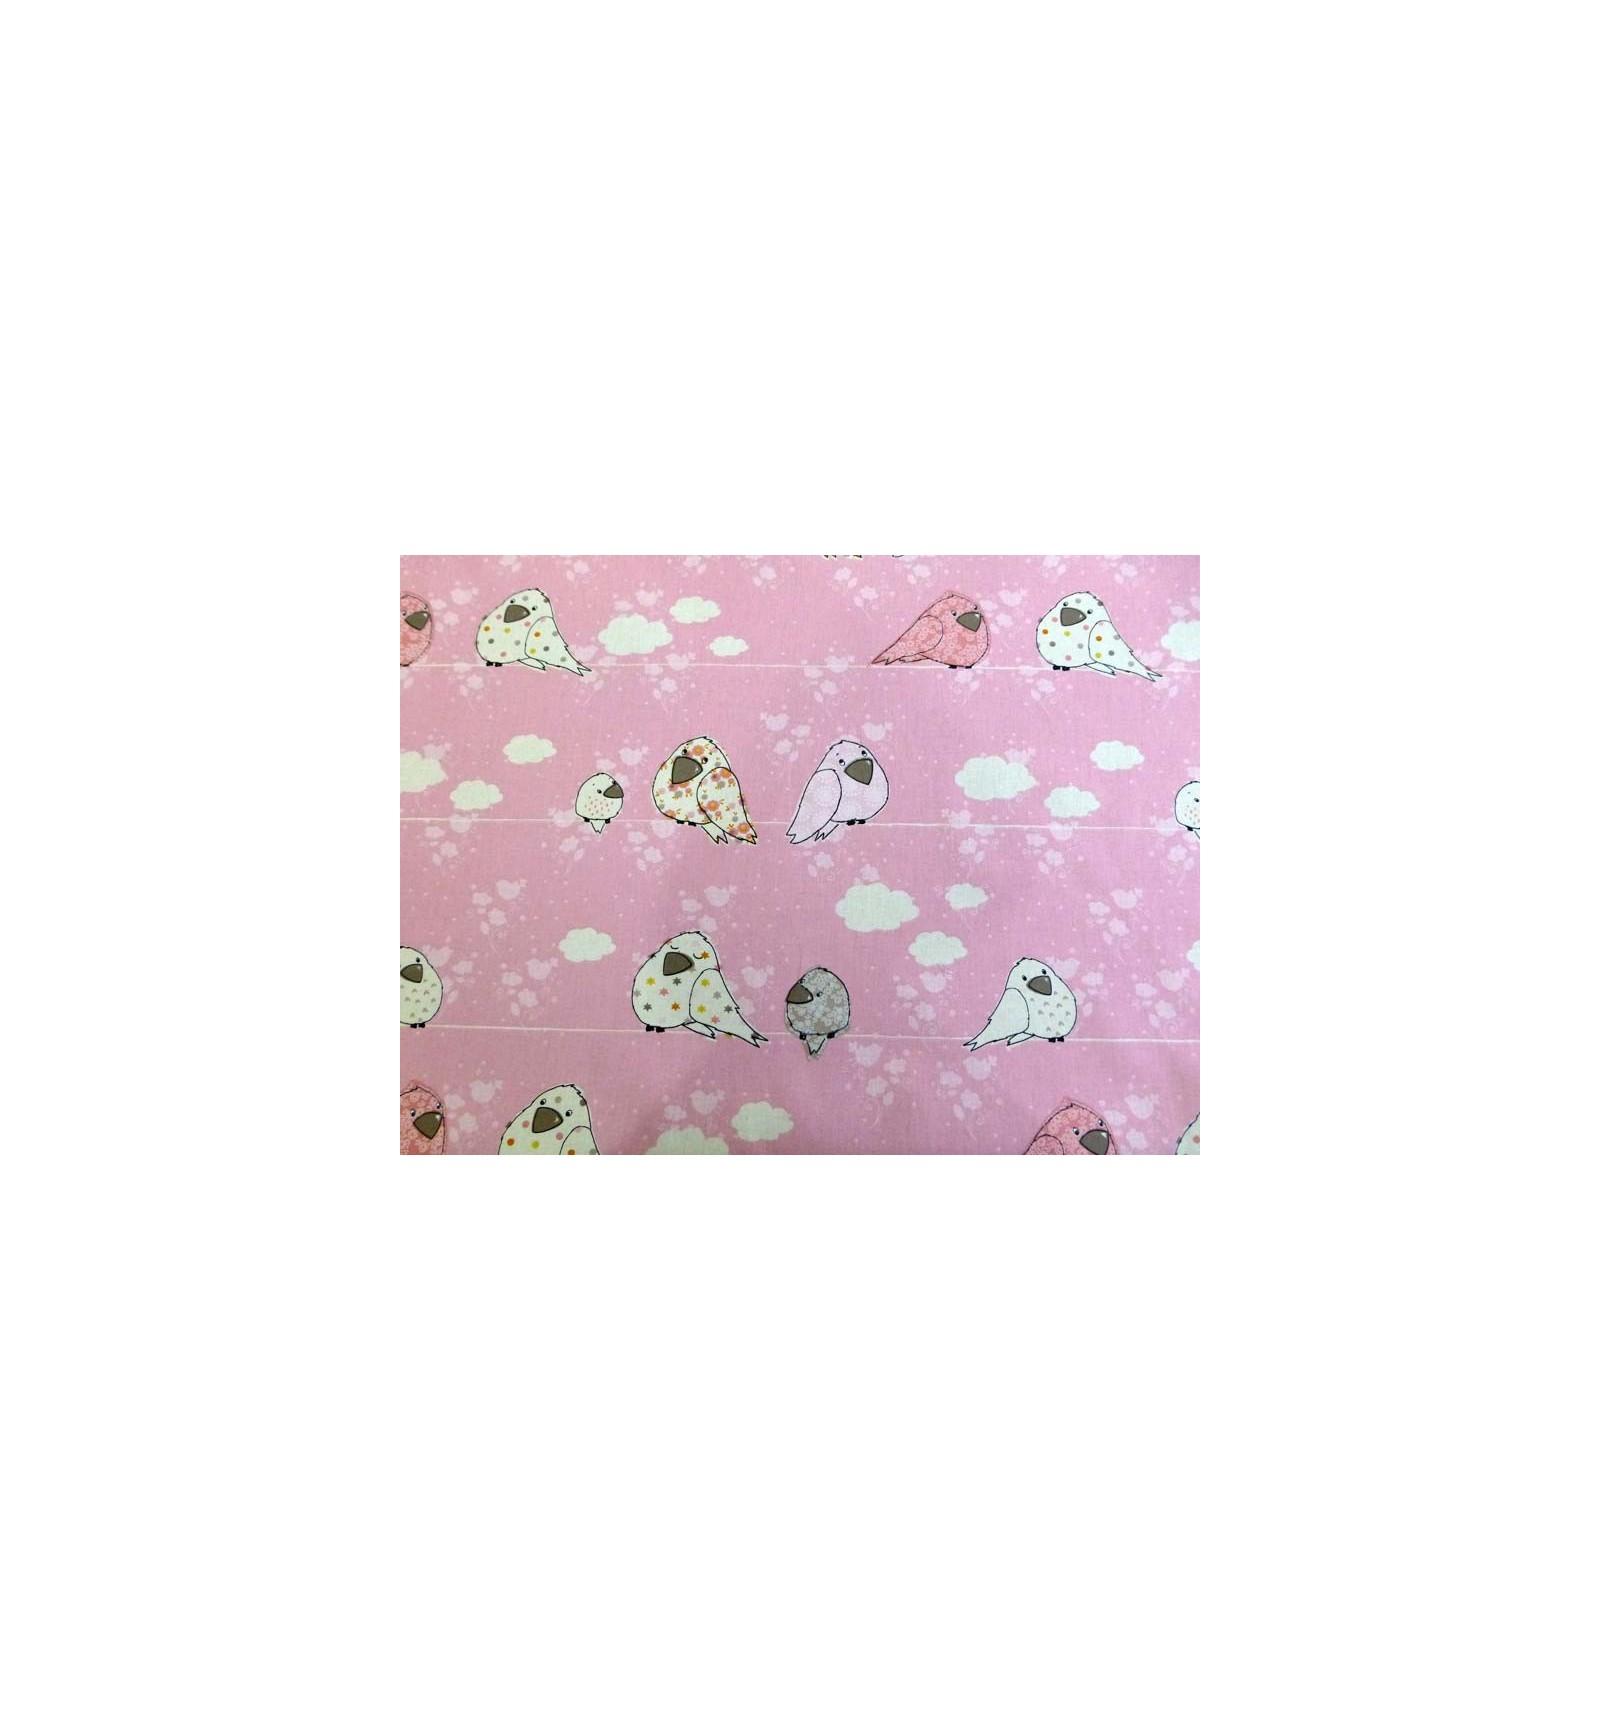 Tissu b b fille rose tissus d coration chambre enfant for Tissu pour chambre bebe